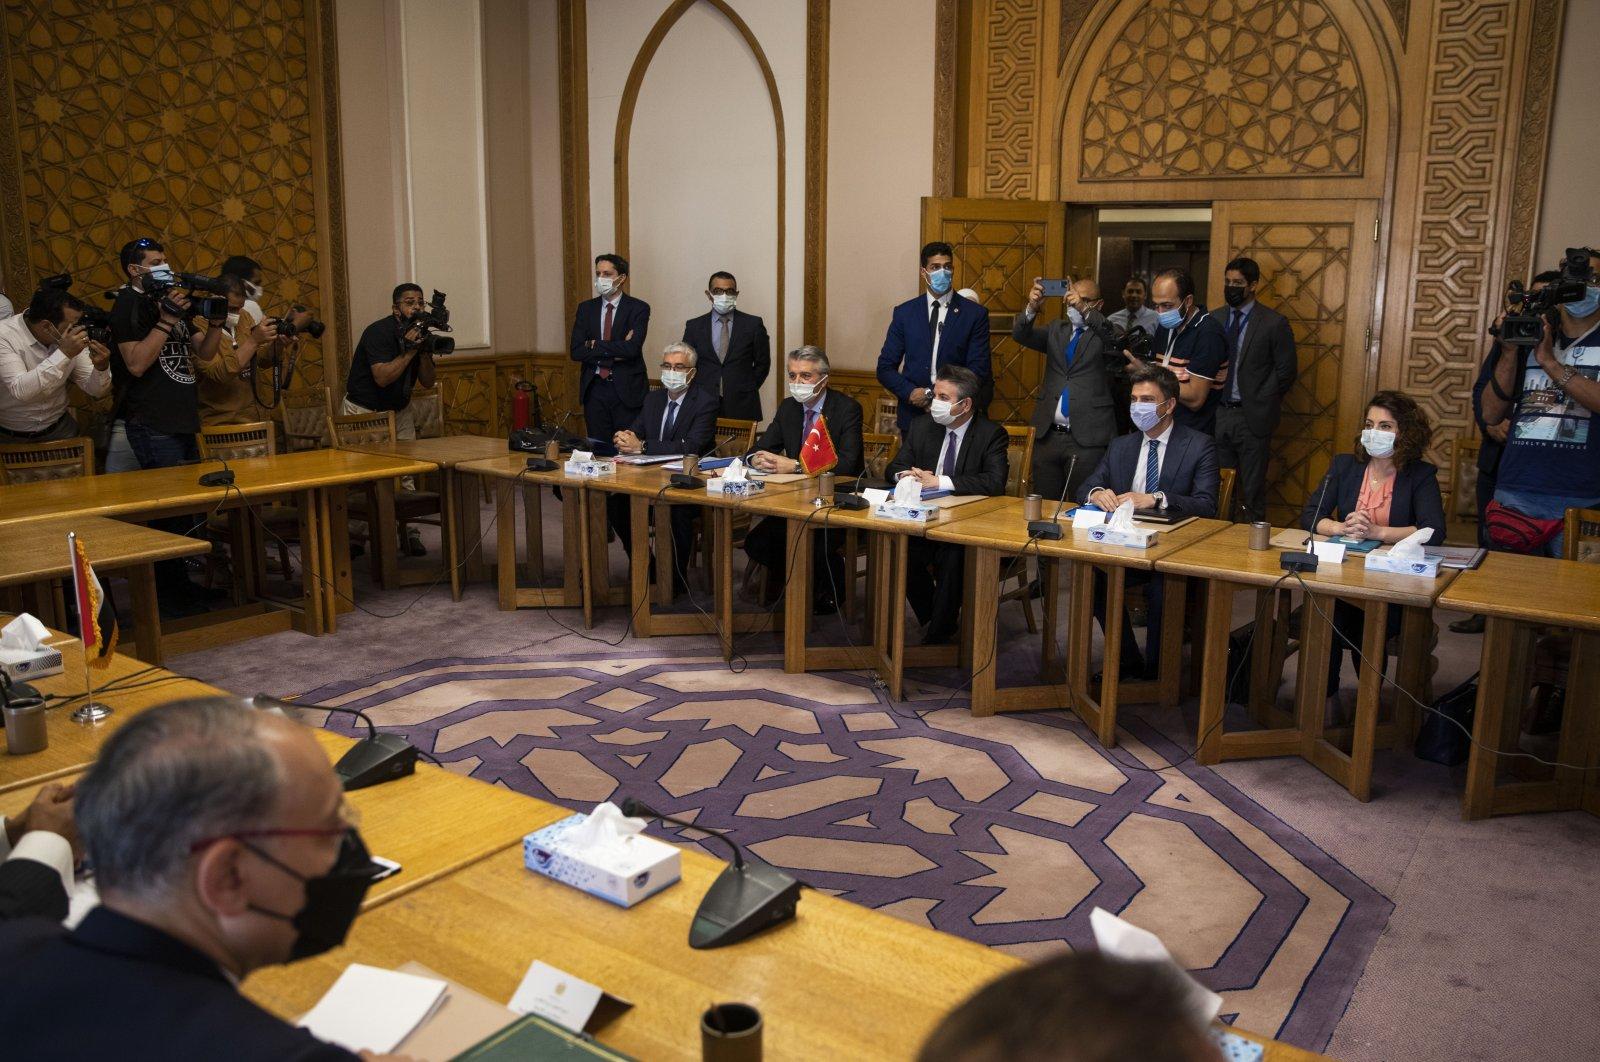 Turkish Deputy Foreign Minister Sedat Önal (3rd R), meets with Hamdi Sanad Loza, Egyptian deputy foreign minister, and their delegations, at the Foreign Ministry in Cairo, Egypt, May 5, 2021. (AP File Photo)